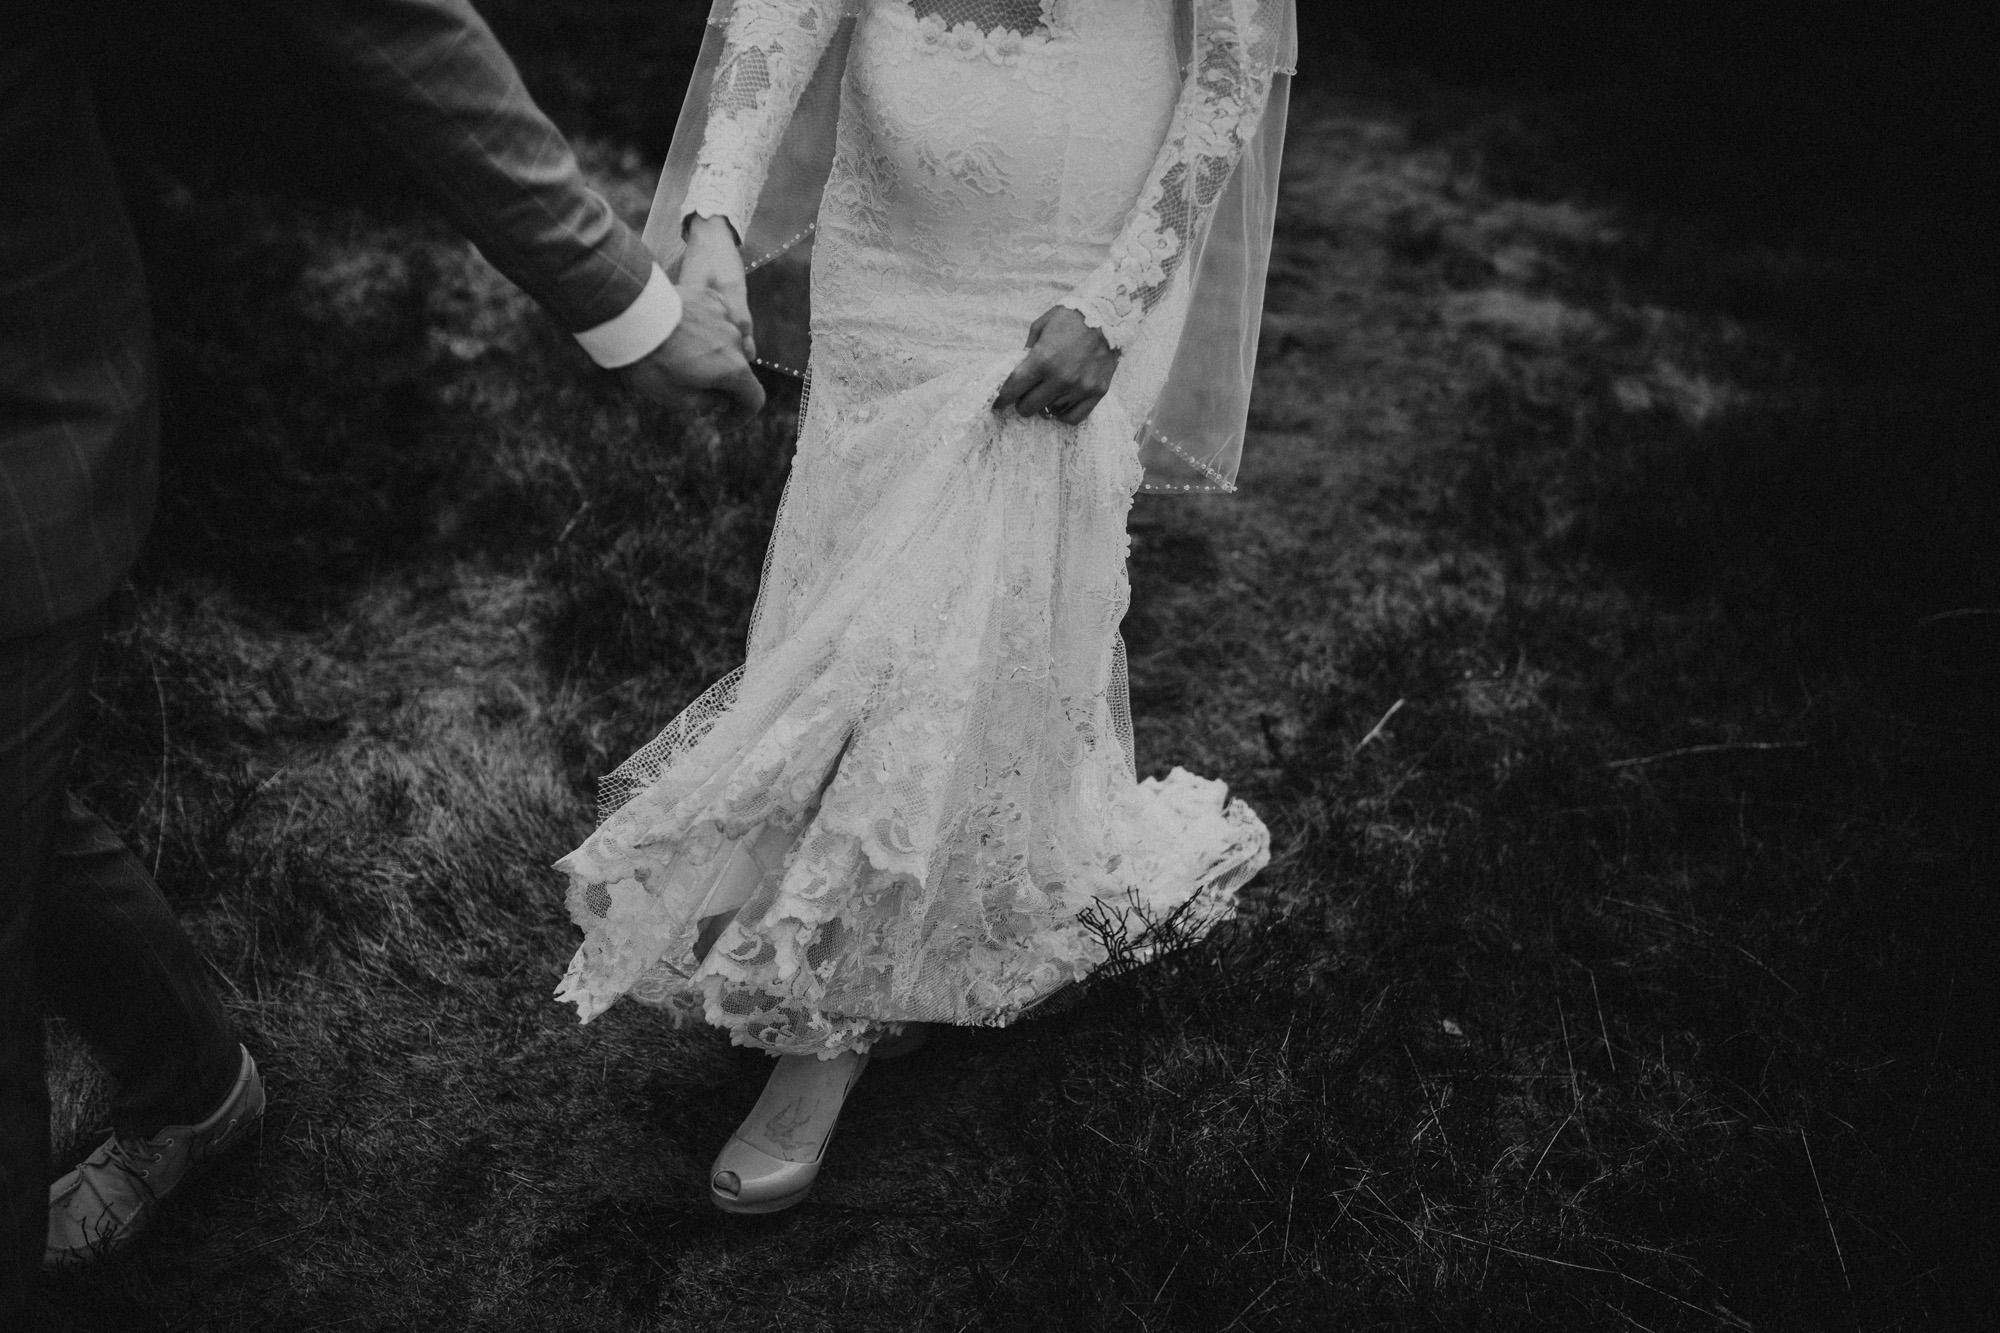 DanielaMarquardtPhotography_Hochzeitsfotograf_Düsseldorf_Köln_Mallorca_Bayern_Austria_Harz_LinaundMaik_Afterwedding-Shooting_Weddingphotographer_Ibiza_Tuskany_Italien_Toskana75